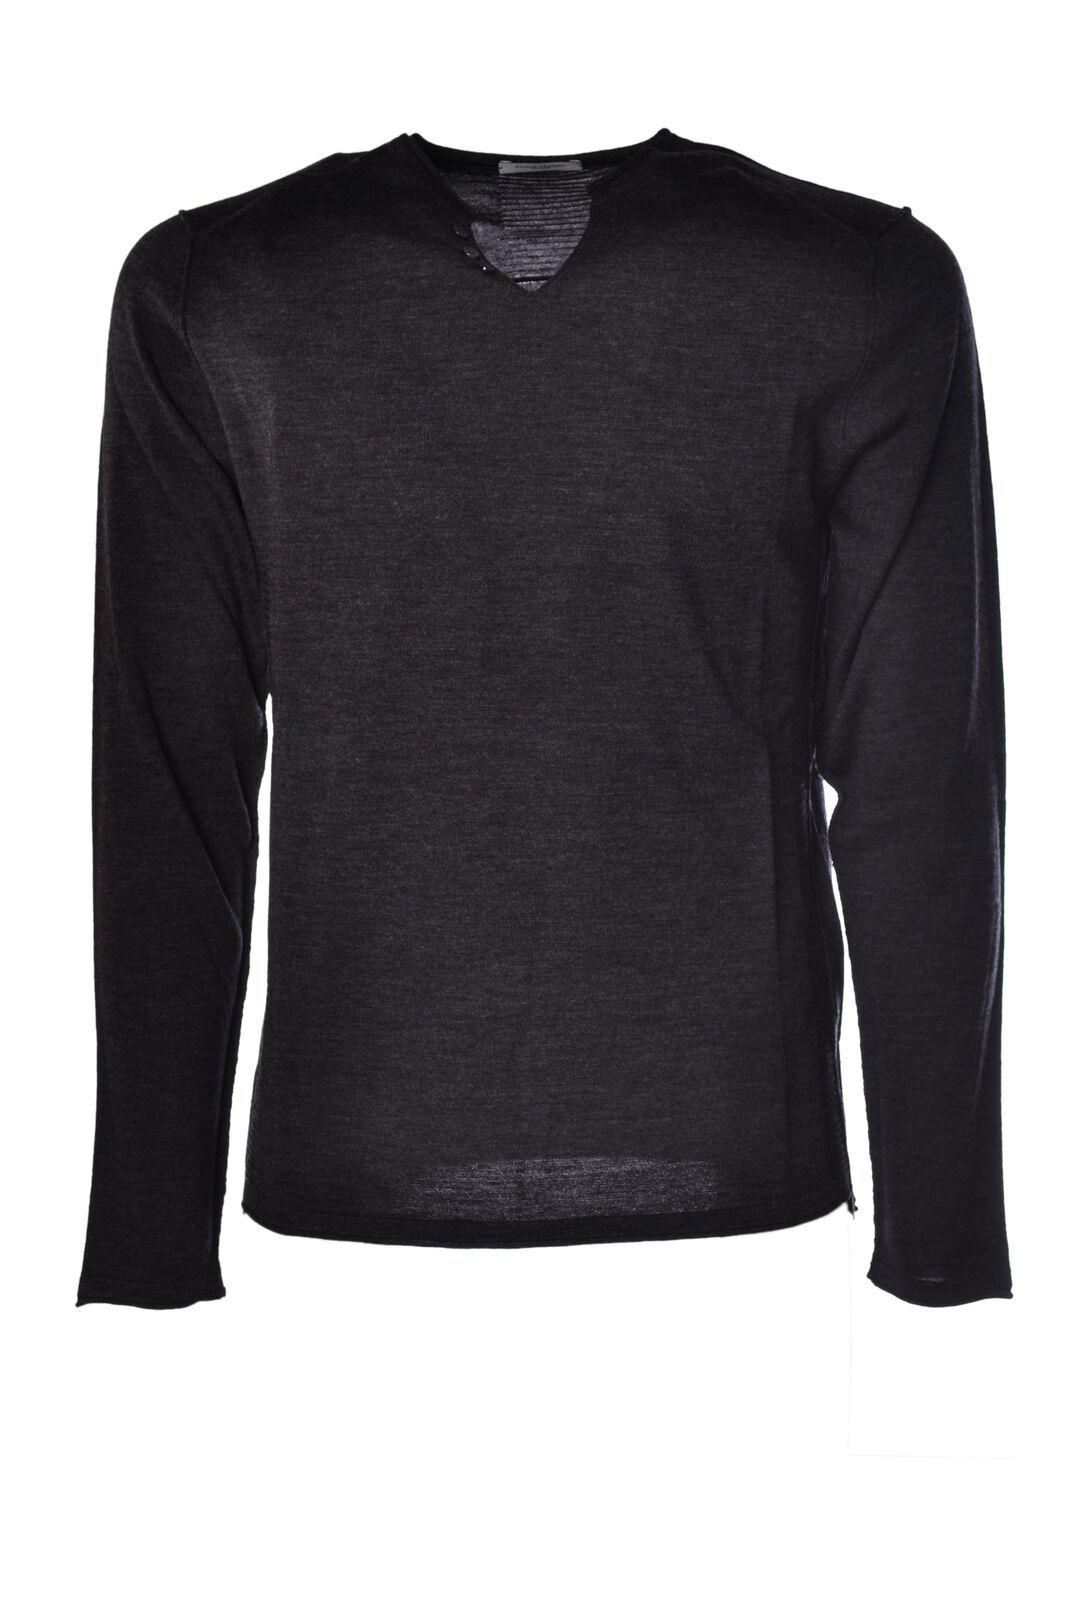 Paolo Pecora - Knitwear-Sweaters - Man - grau - 1009329F190602